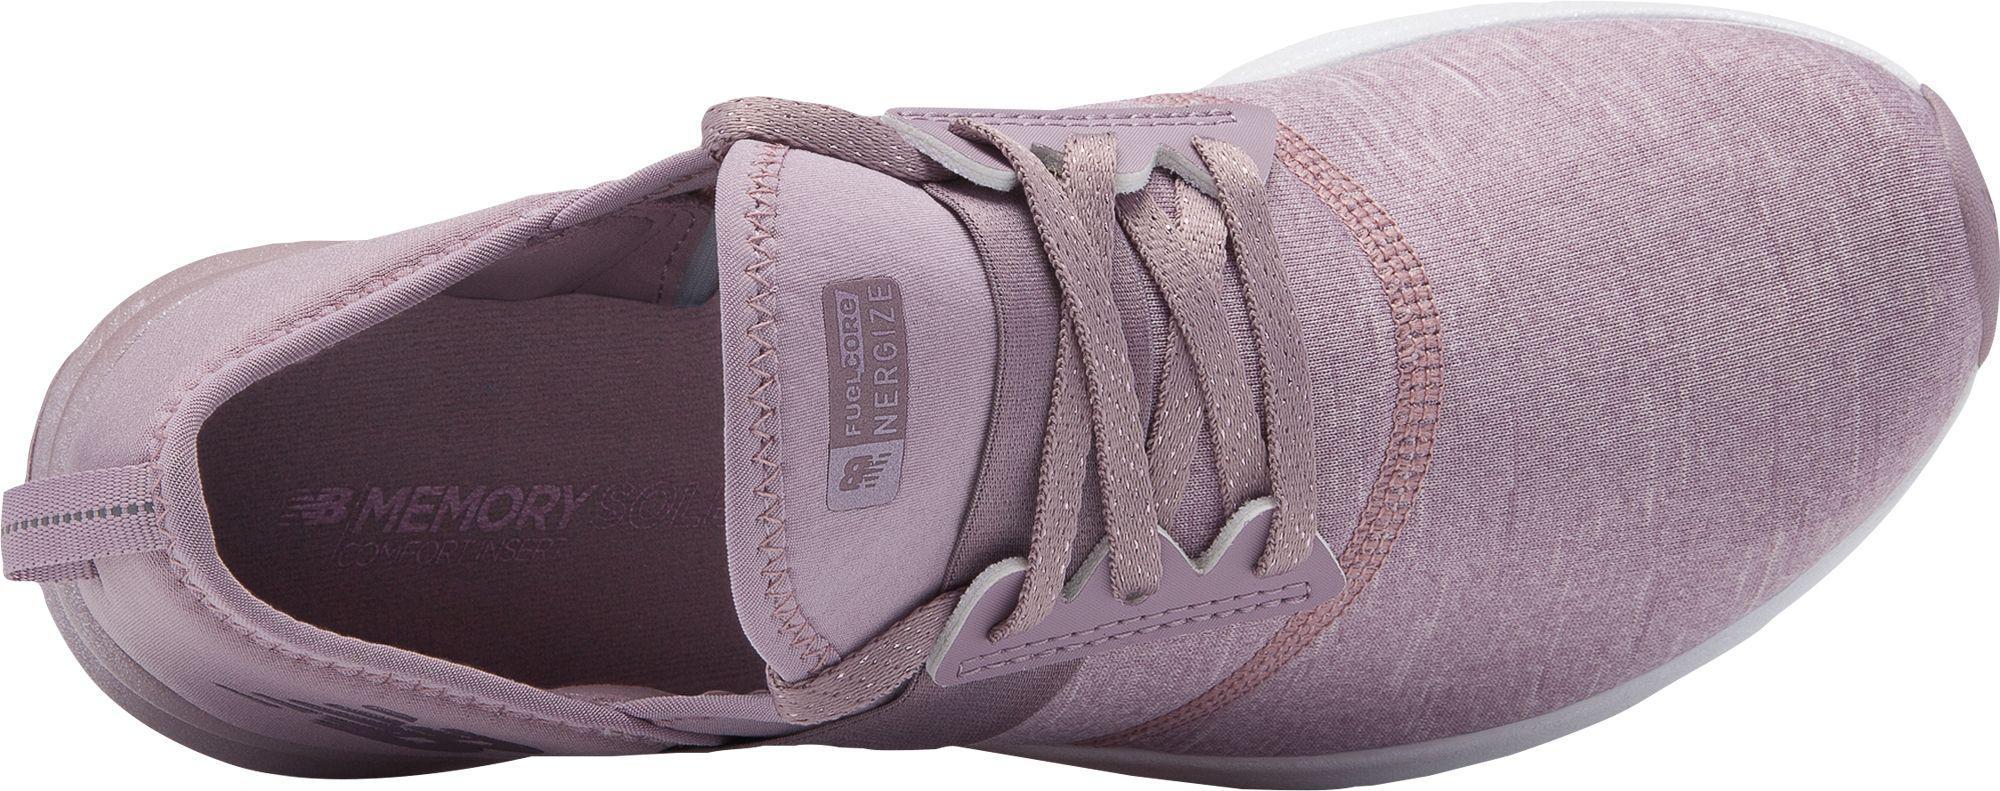 76b89183 New Balance Purple Fuel Core Nergize Metallic Walking Shoes